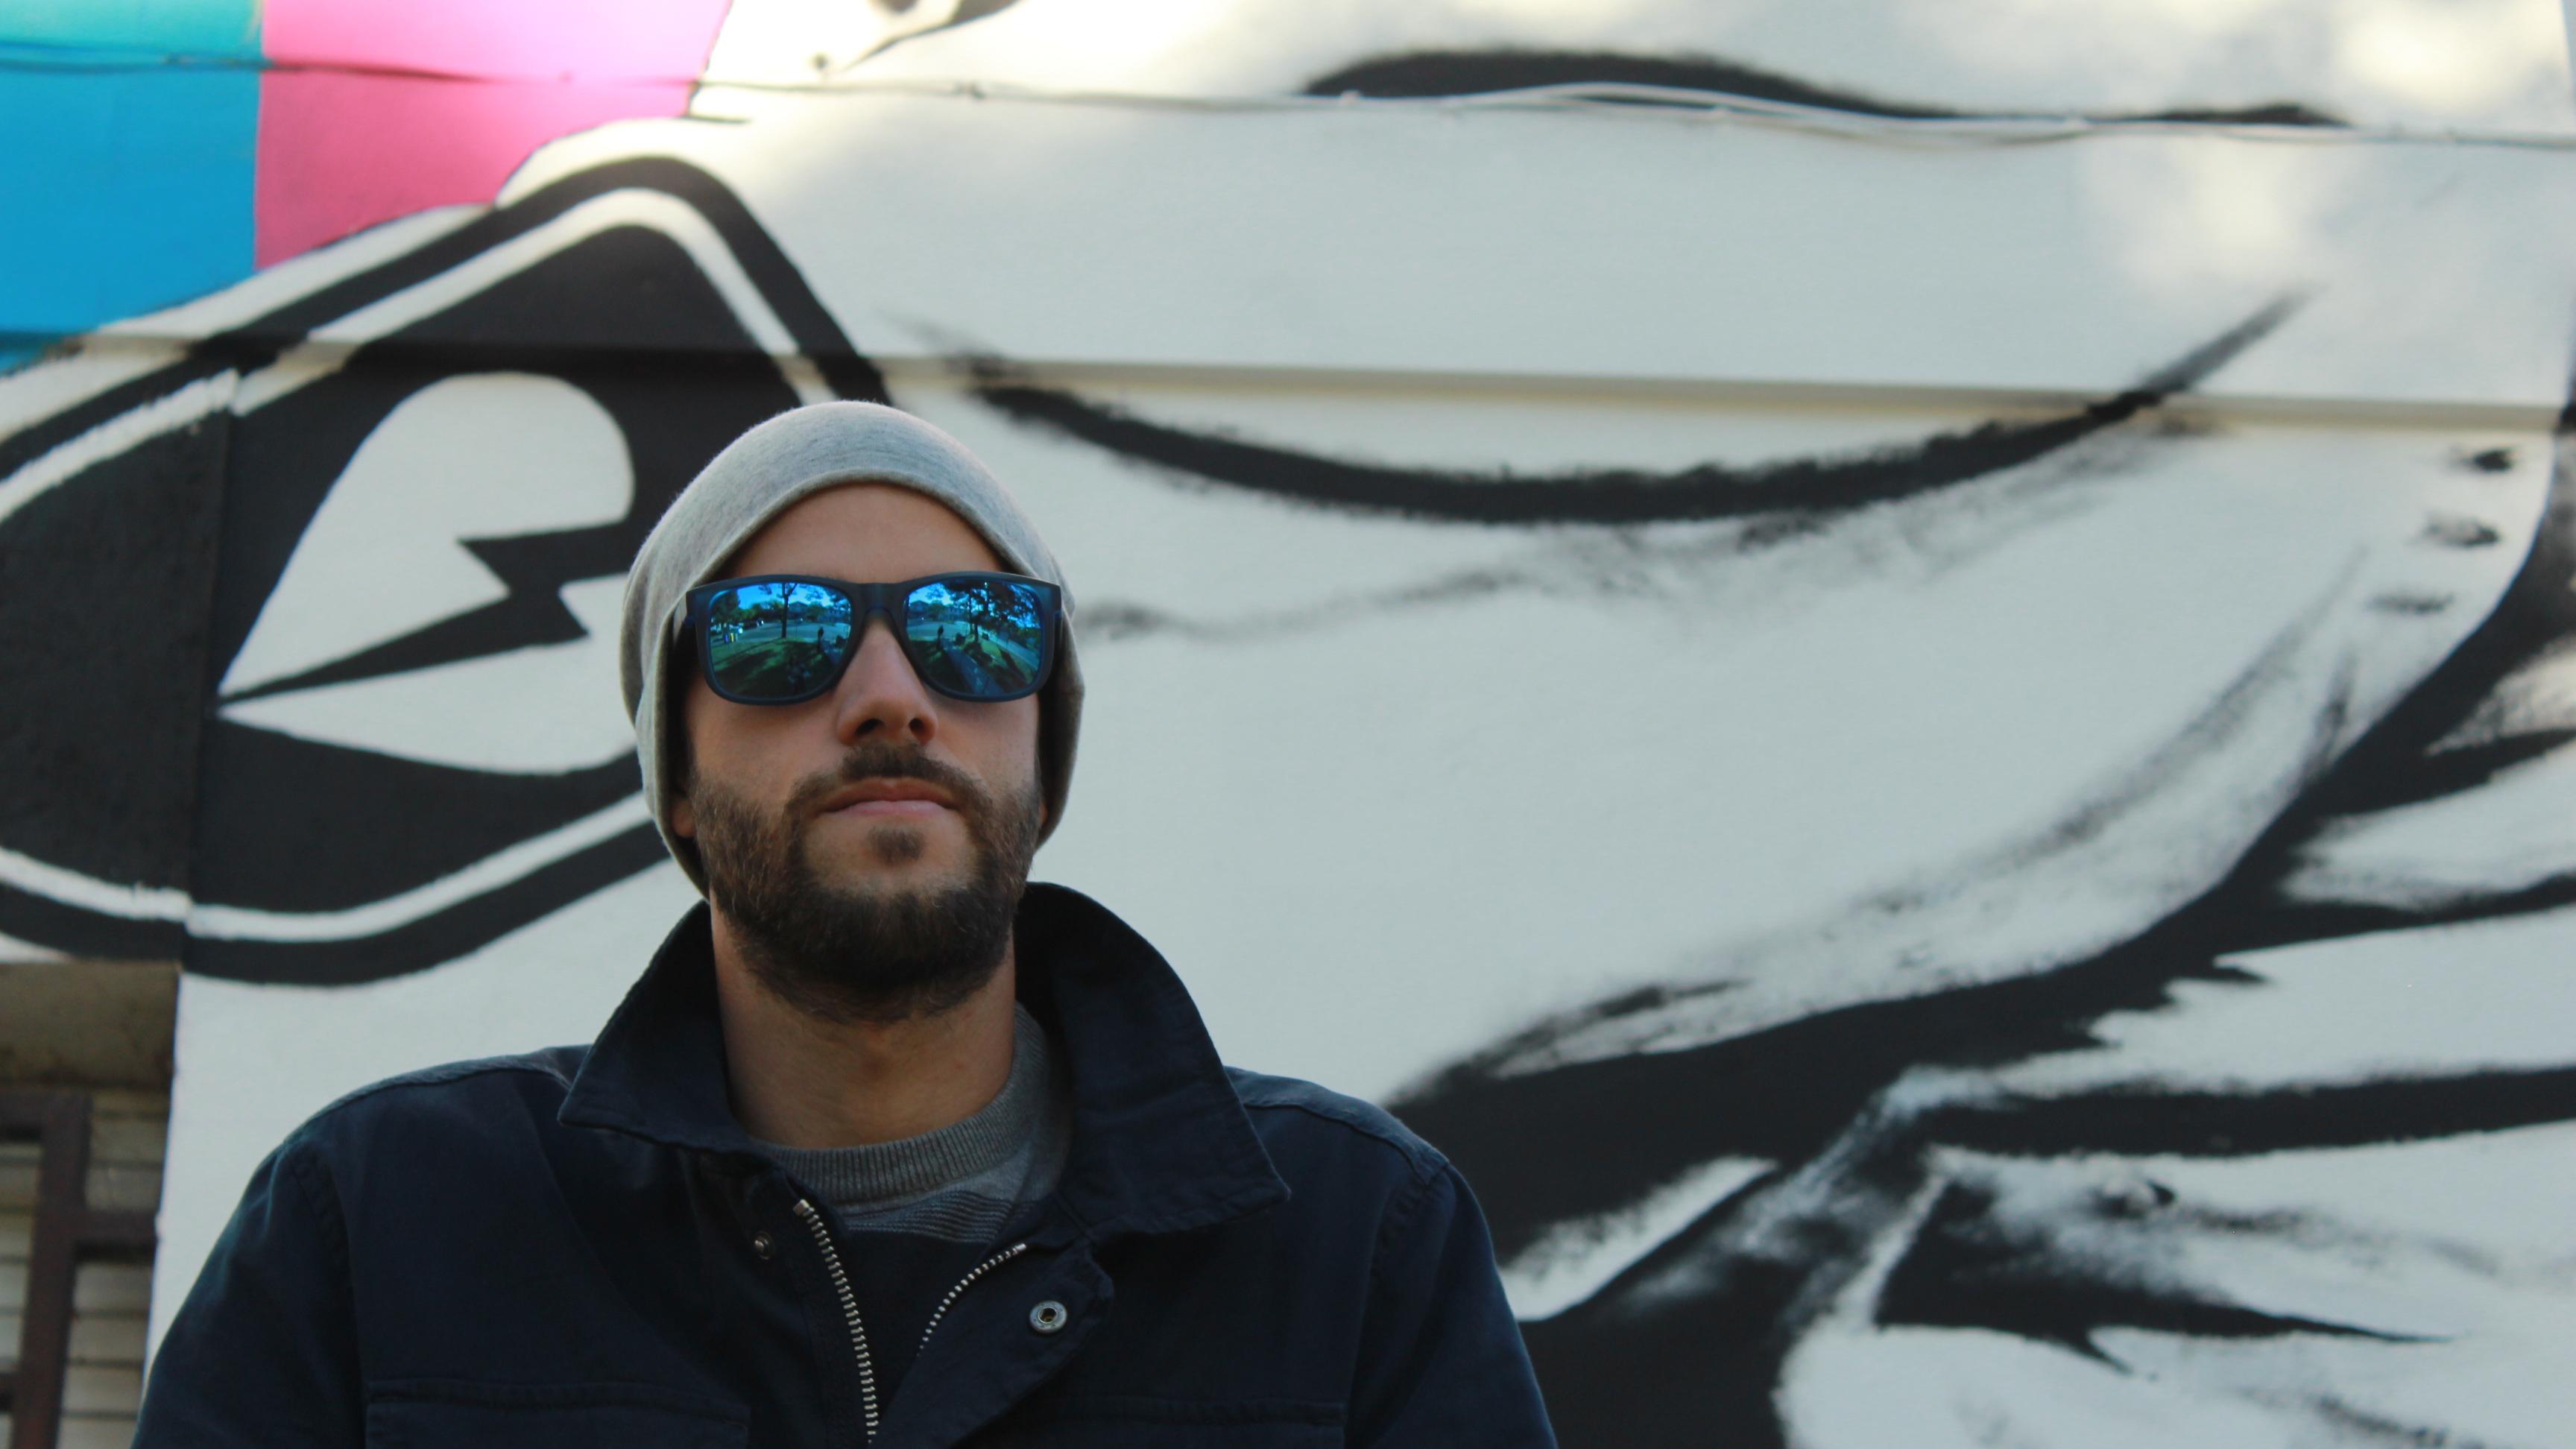 Riccardo Buonafede, poetica della Street-Arte – Intervista